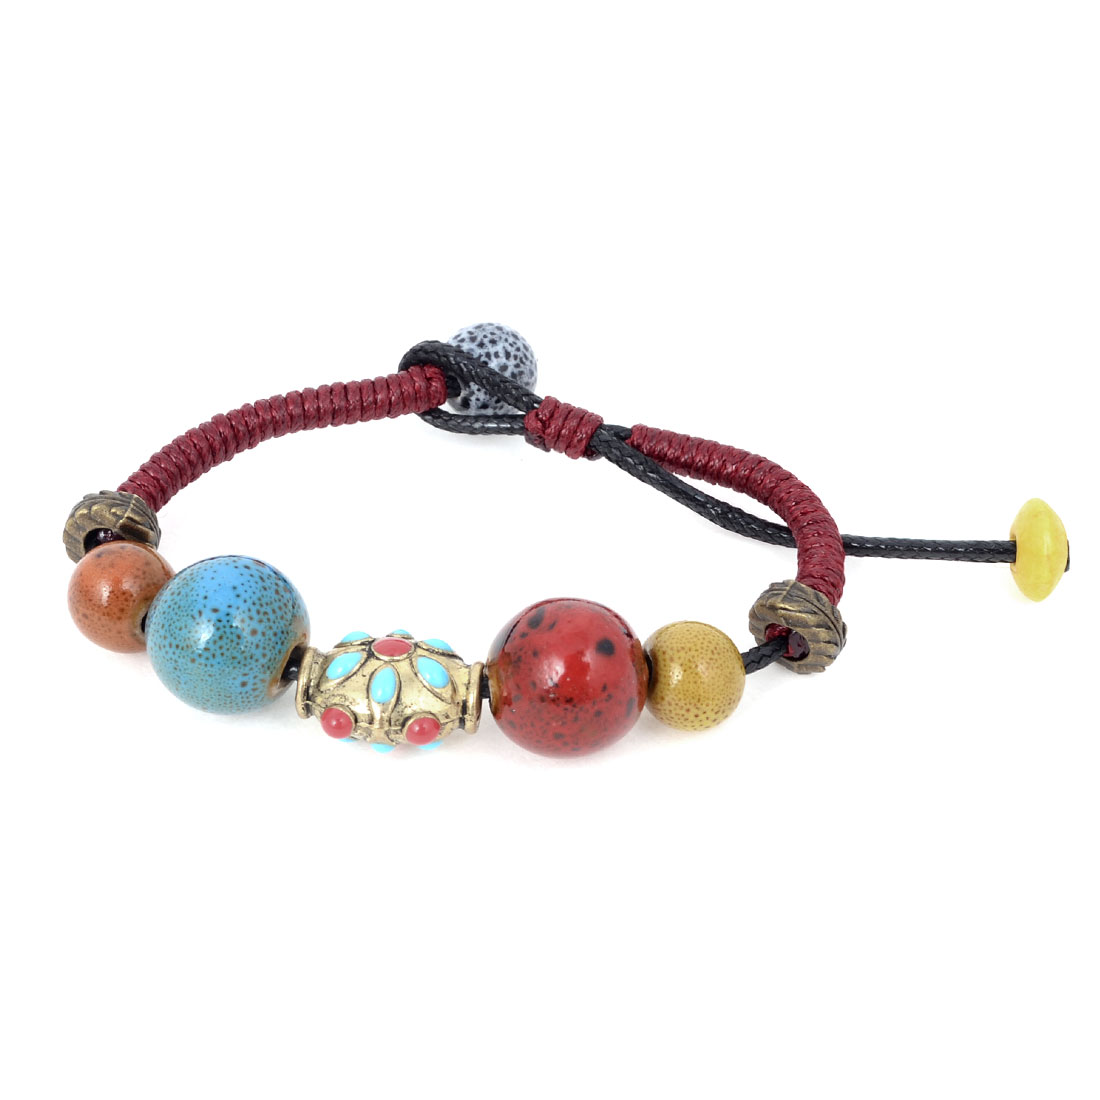 Lady Vintage Style Multiple Pastel Color Ceramic Beads Handmade Braided Bracelet